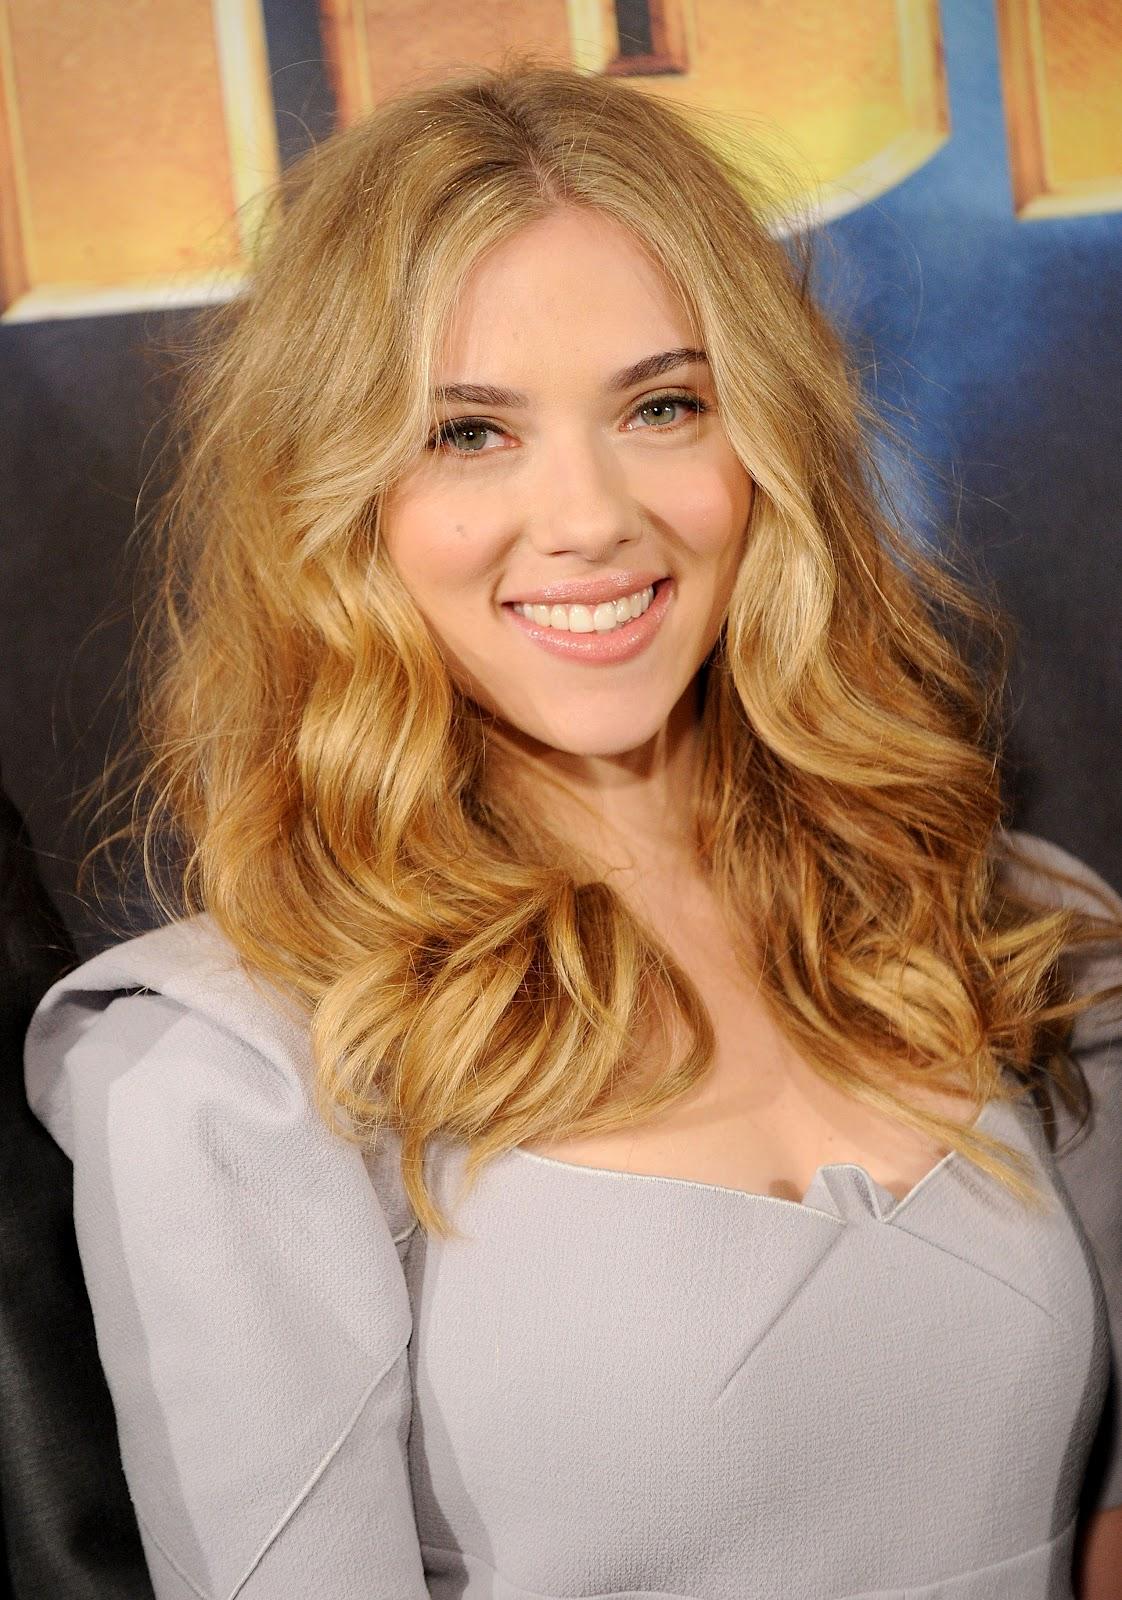 49. Scarlett Johansson nudes (51 images) Cleavage, iCloud, in bikini